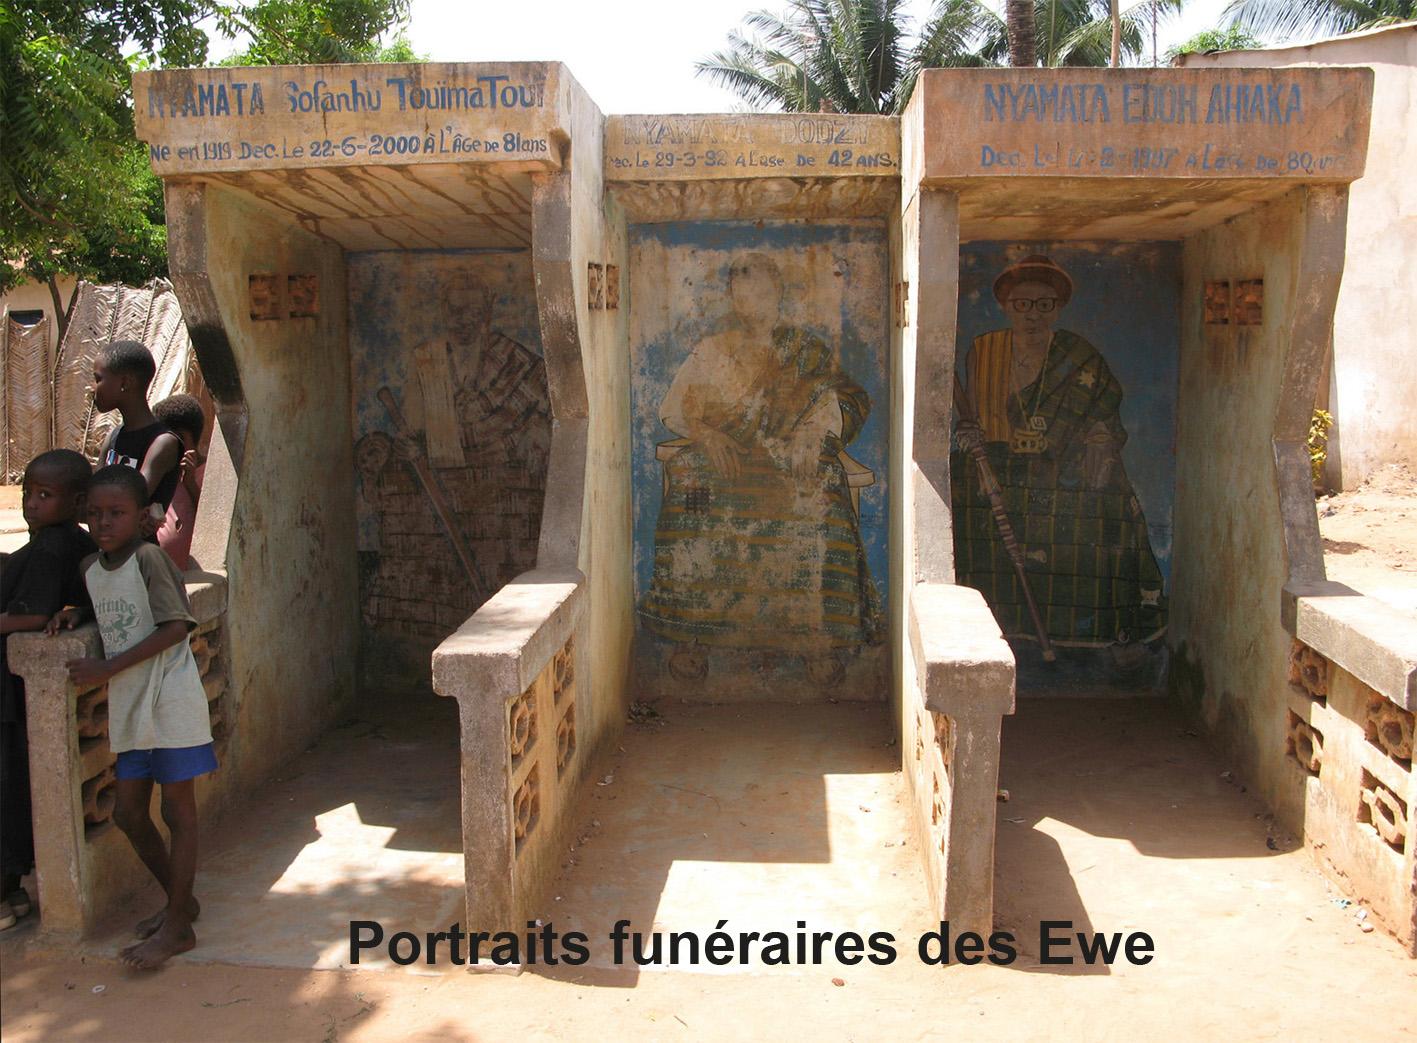 Portraits funéraires des Ewe/Funerary Ewe Portraits